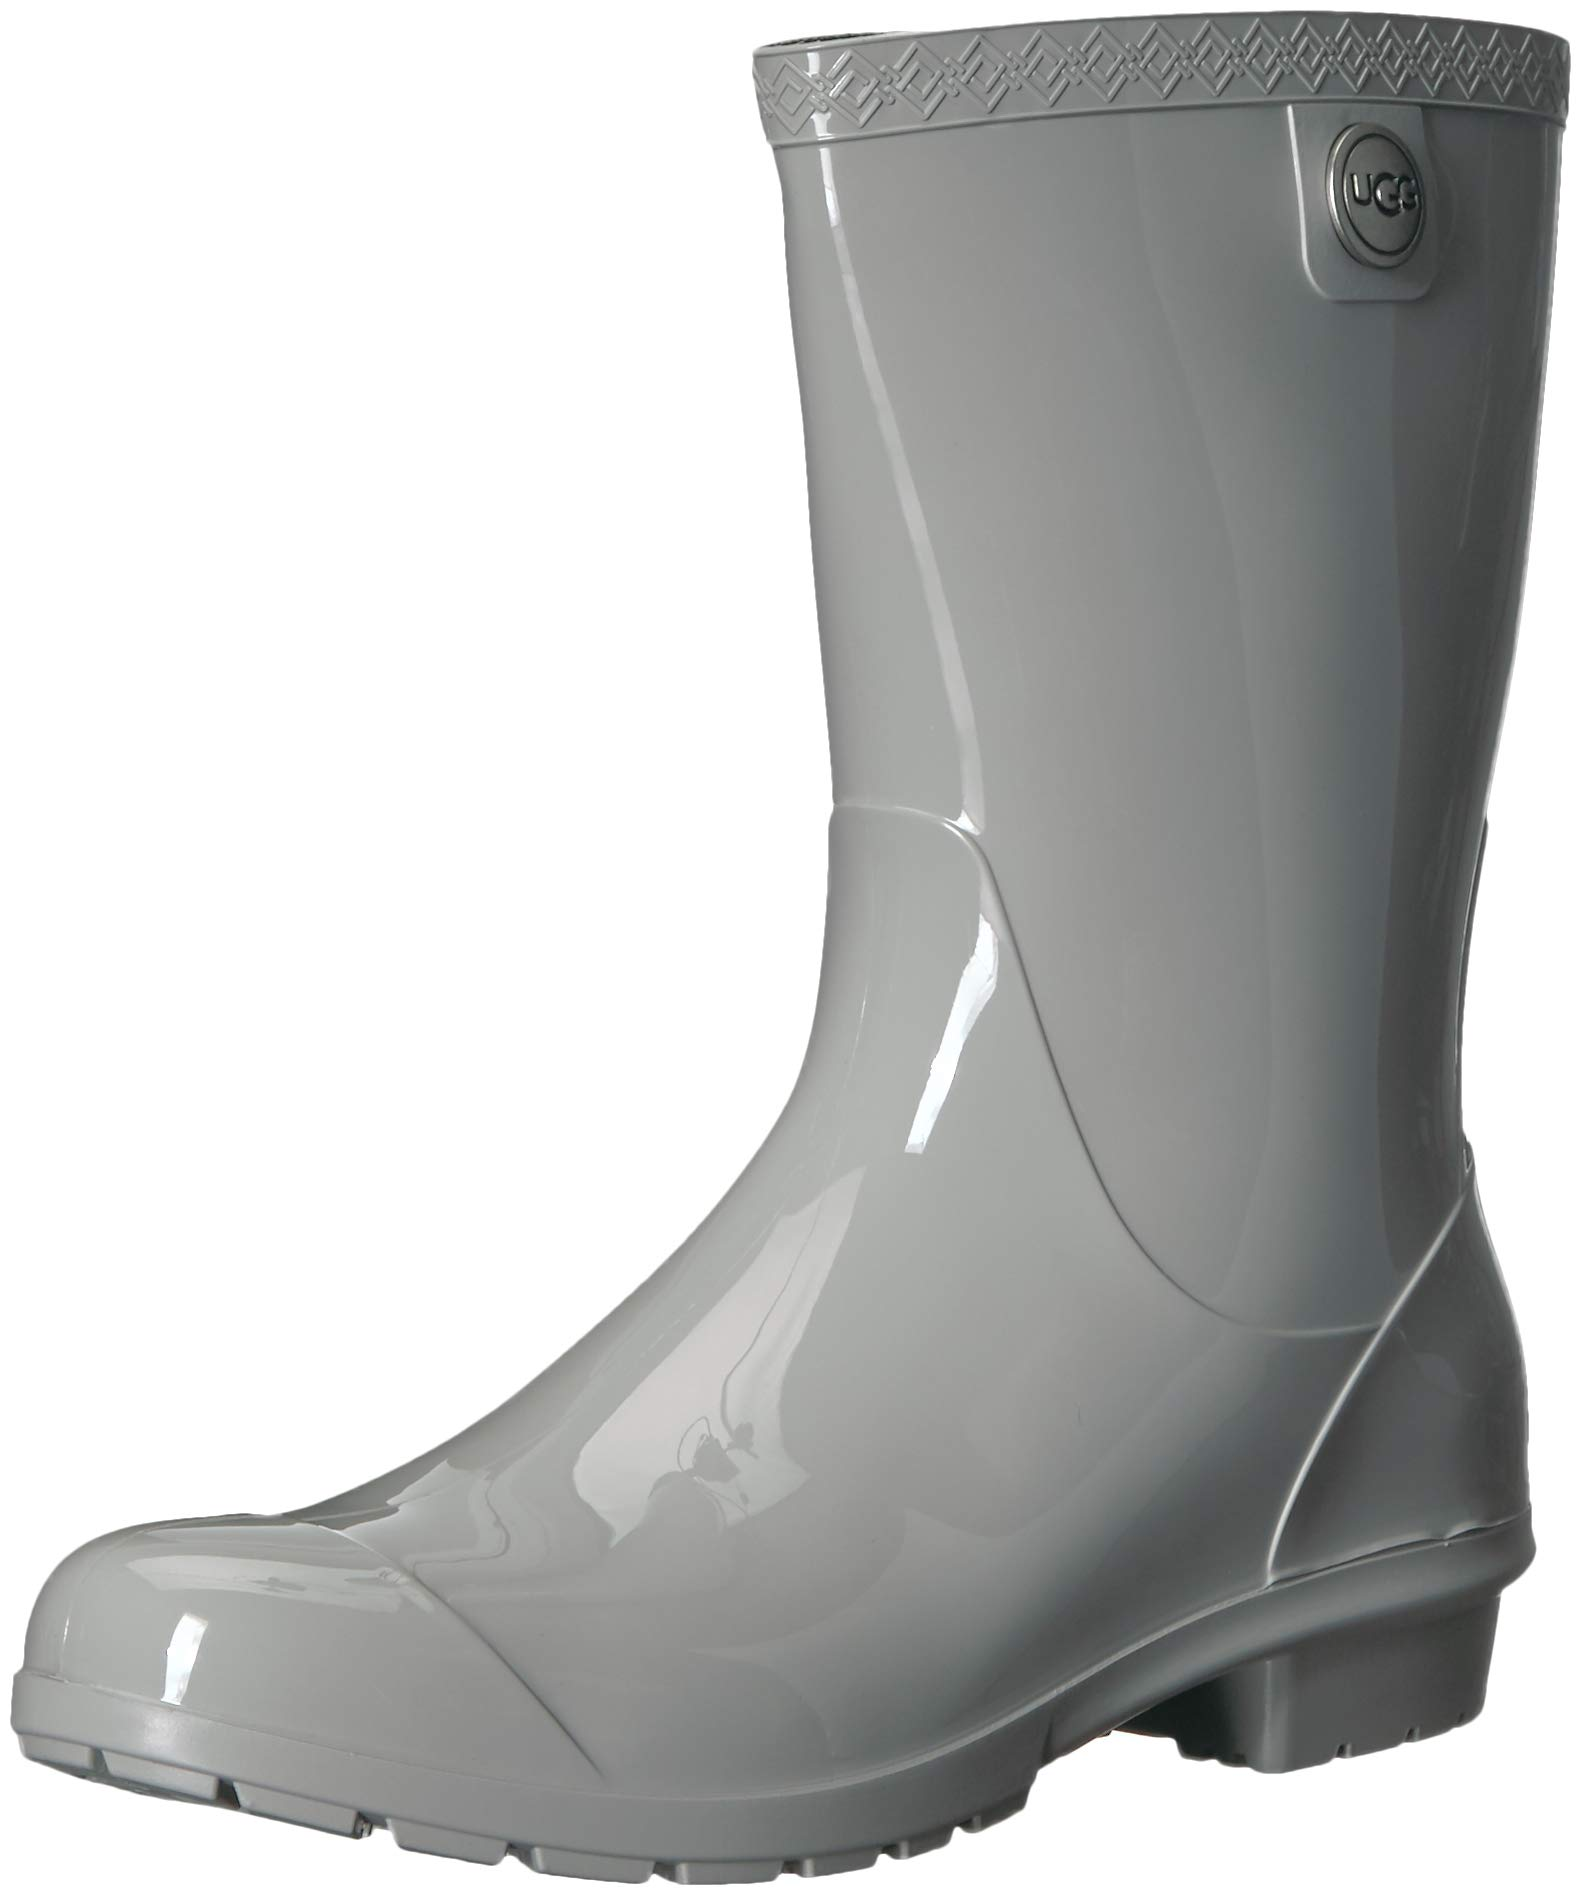 UGG Women's Sienna Rain Boot Seal 7 M US